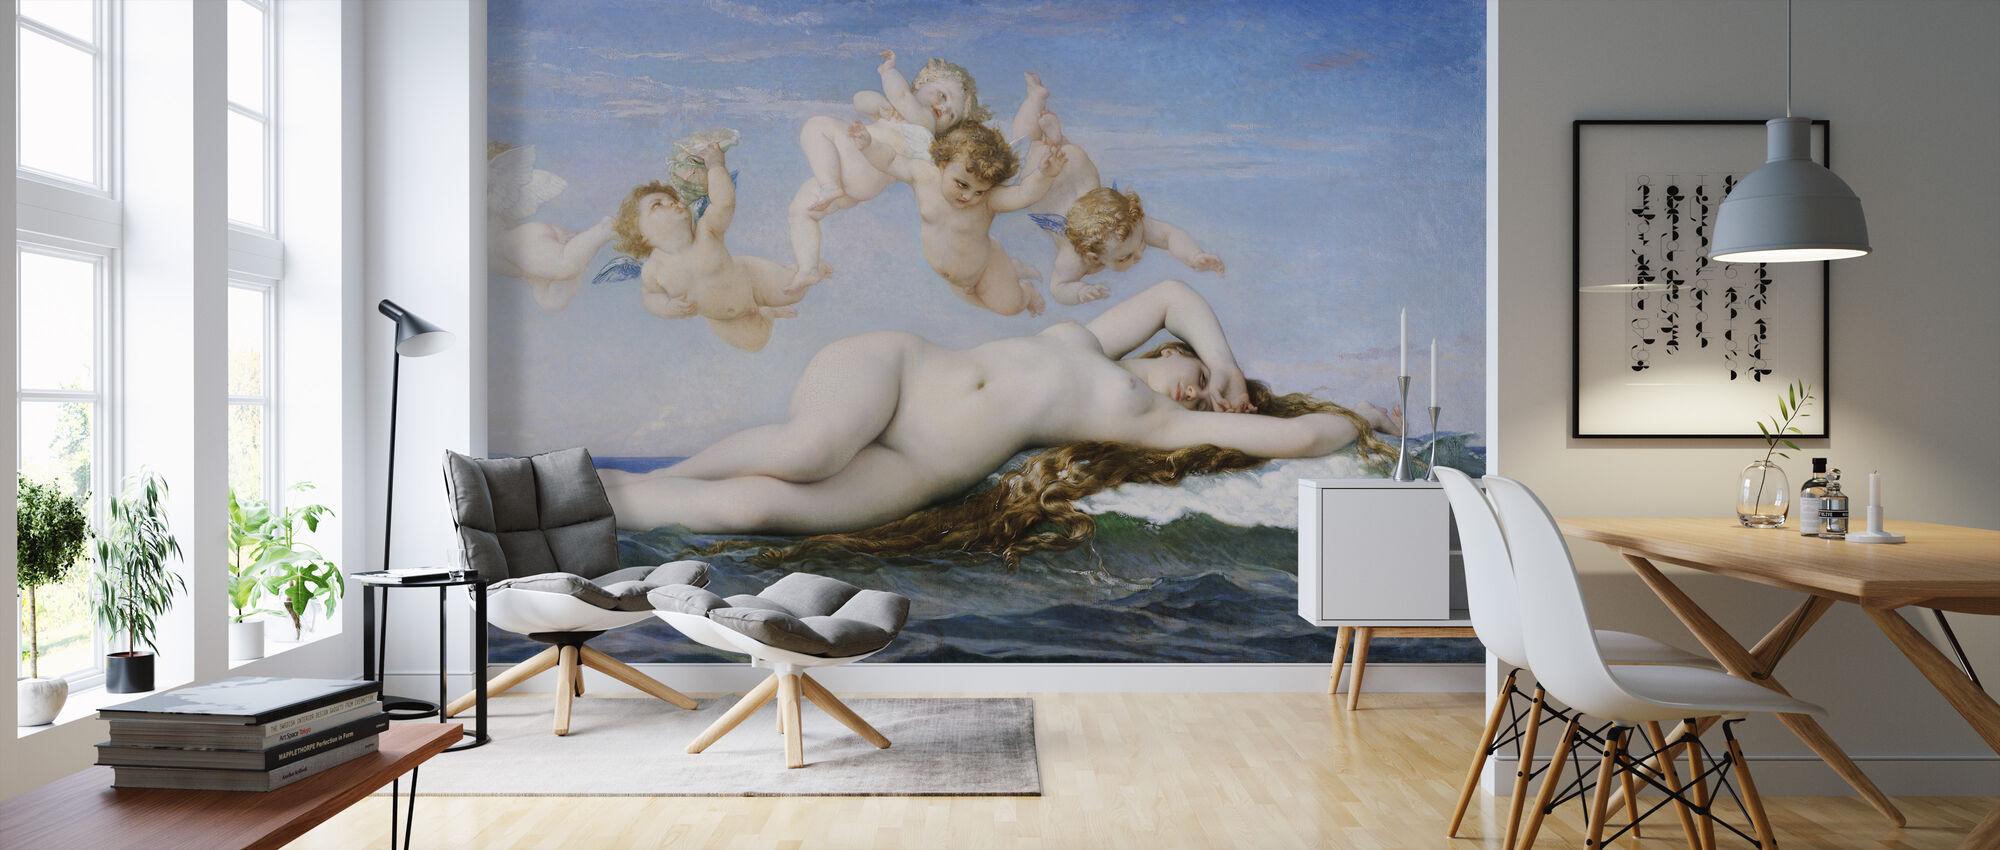 Birth of Venus, Alexandre Cabanel - Wallpaper - Living Room